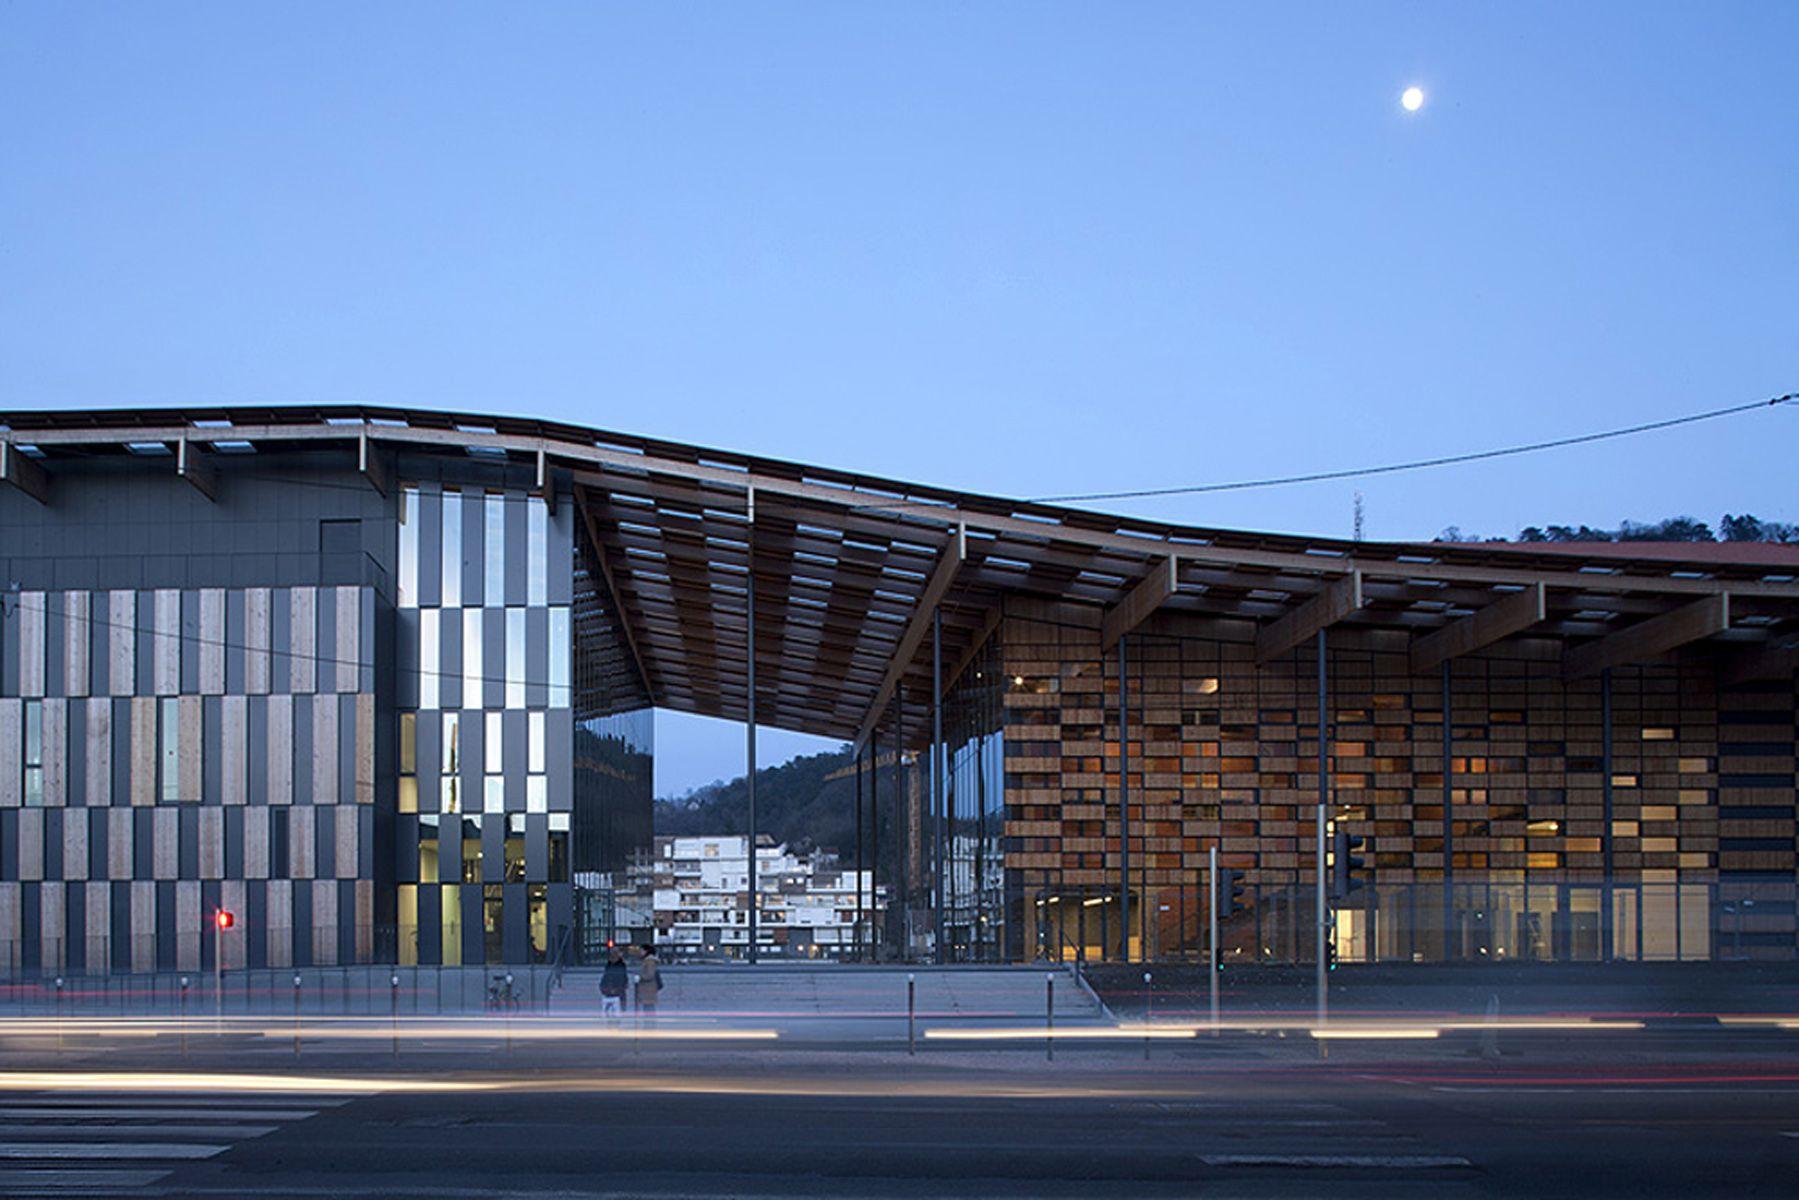 besan on art center and cit de la musique kengo kuma architecture and facades. Black Bedroom Furniture Sets. Home Design Ideas